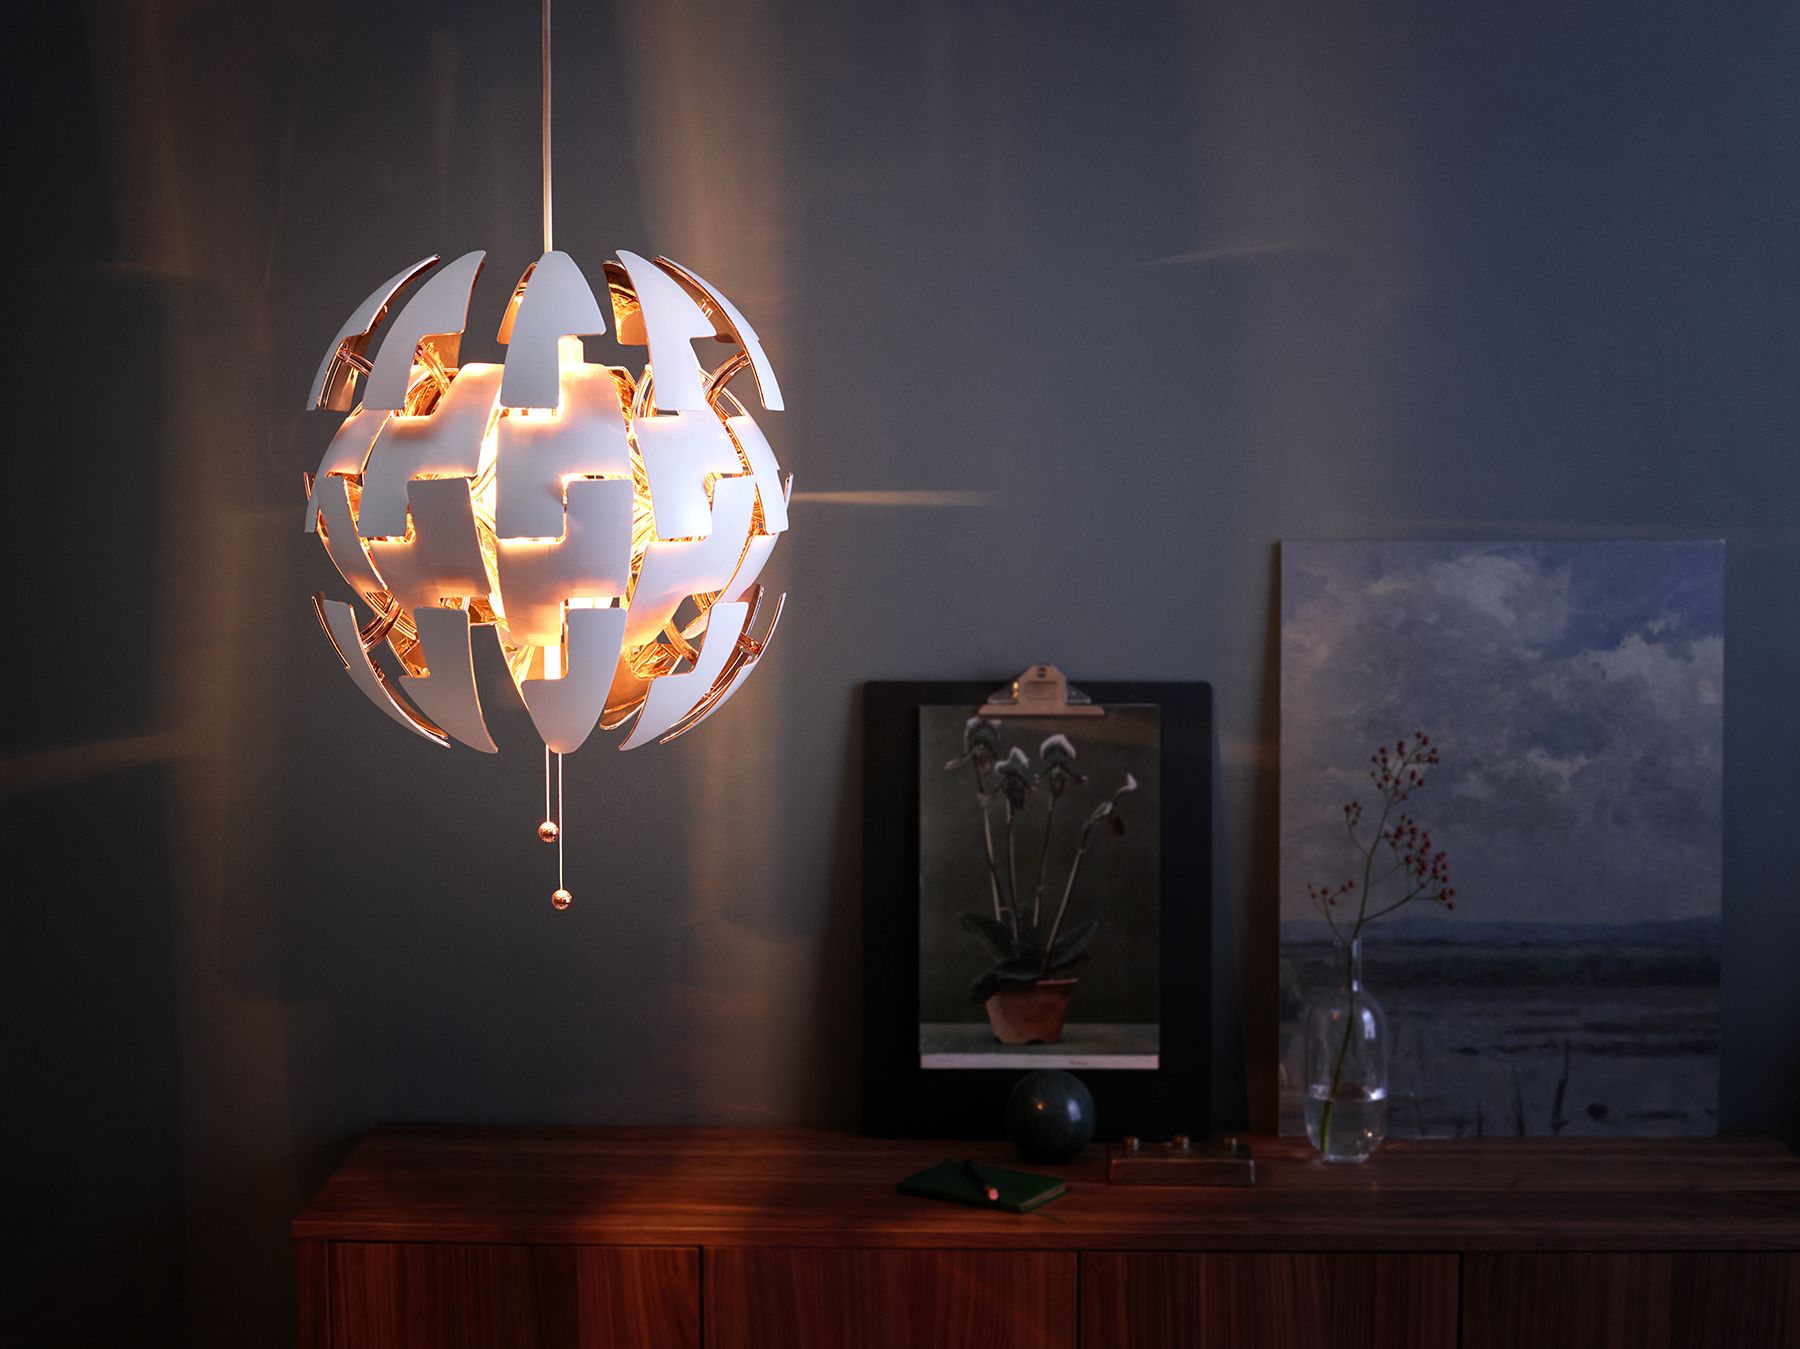 IKEA PS 2014 Hanglamp, wit, koperkleur | Ikea ps 2014, Ikea ps and ...